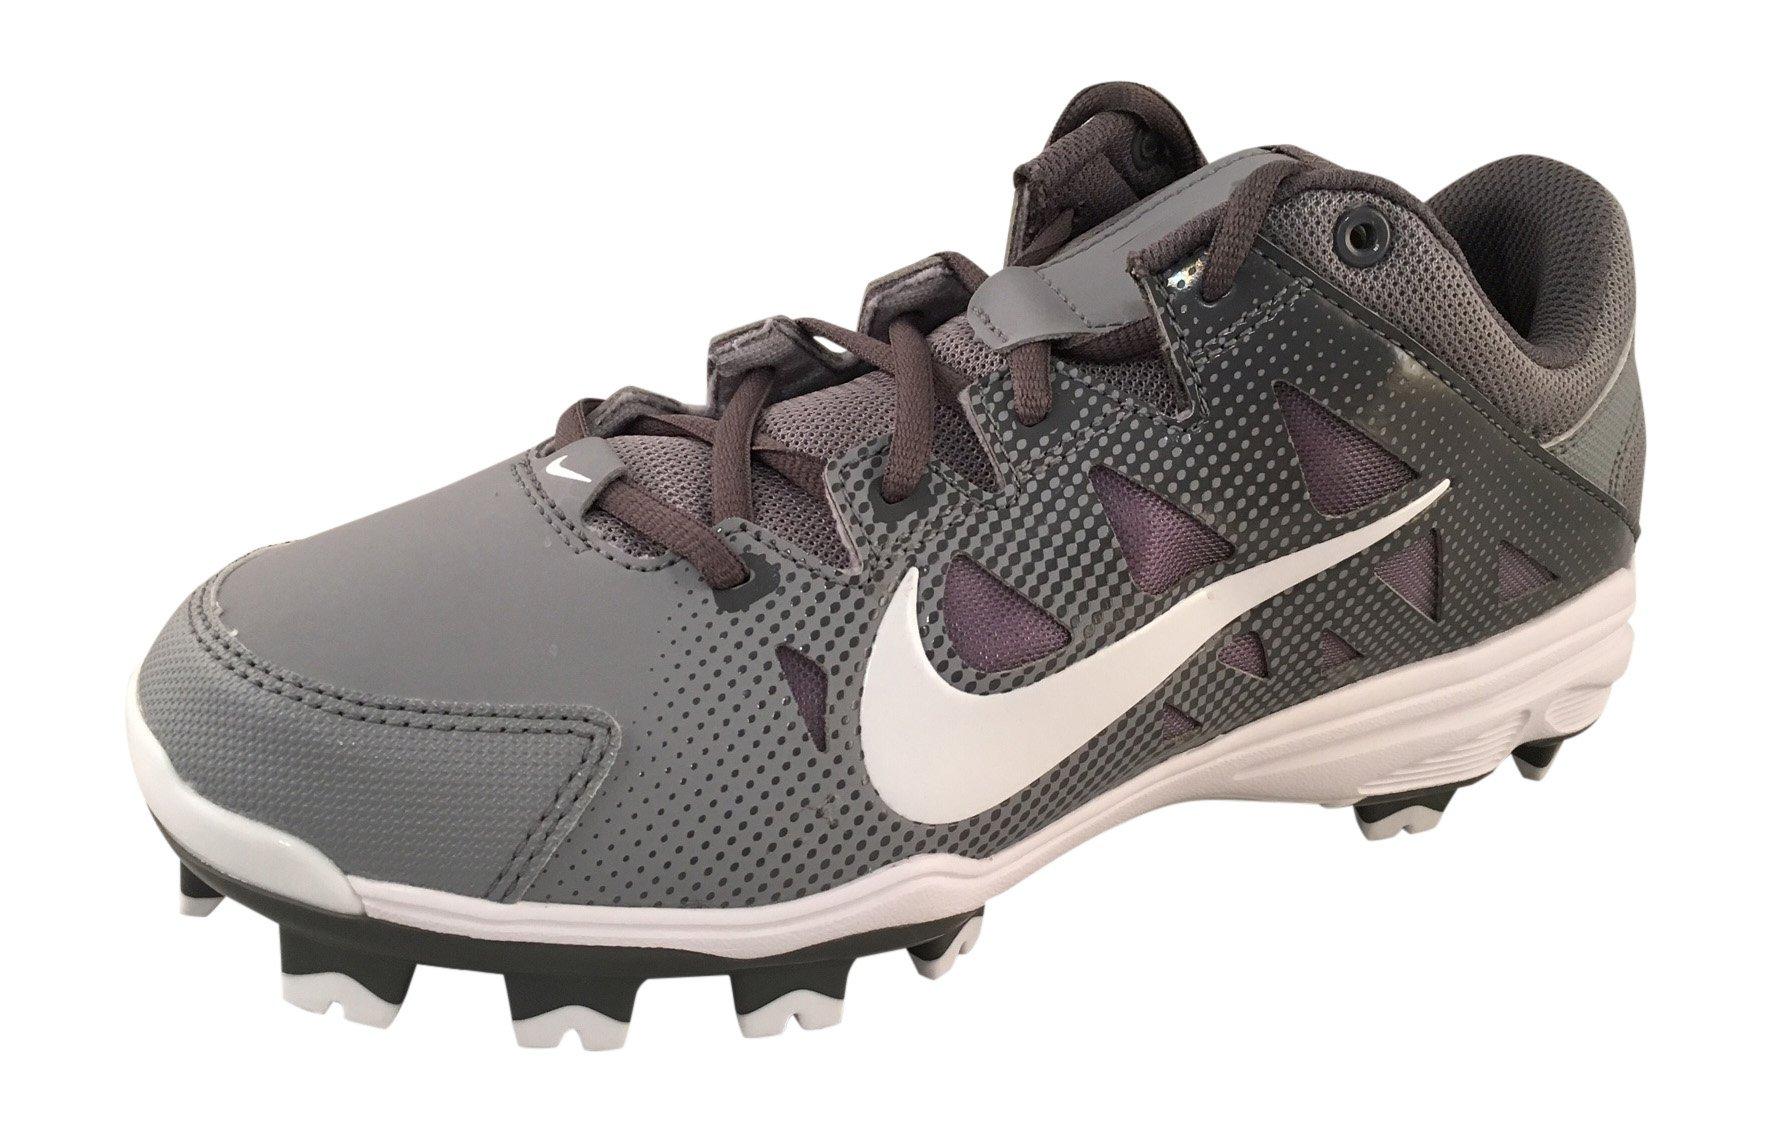 Nike Womens Hyperdiamond Strike Molded Softball Cleats, Gray/White, SZ 8